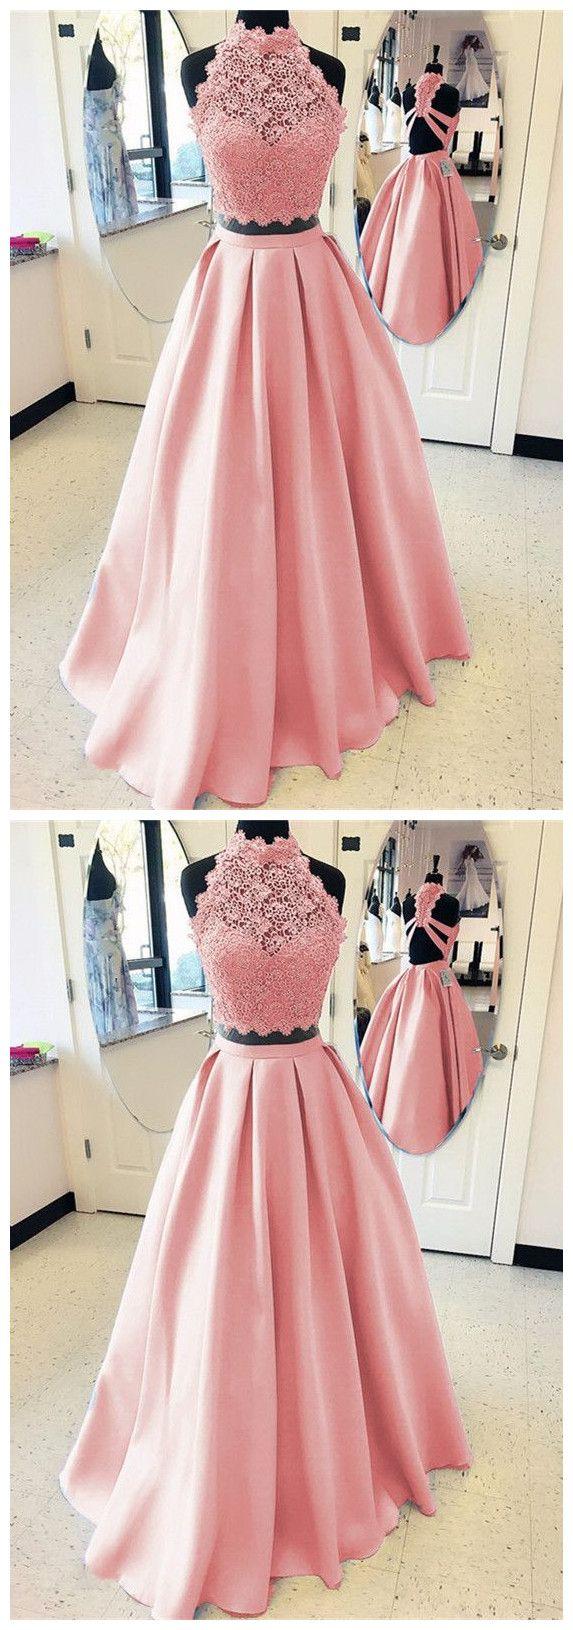 Elegant aline high neck open back satin prom dresses two piece